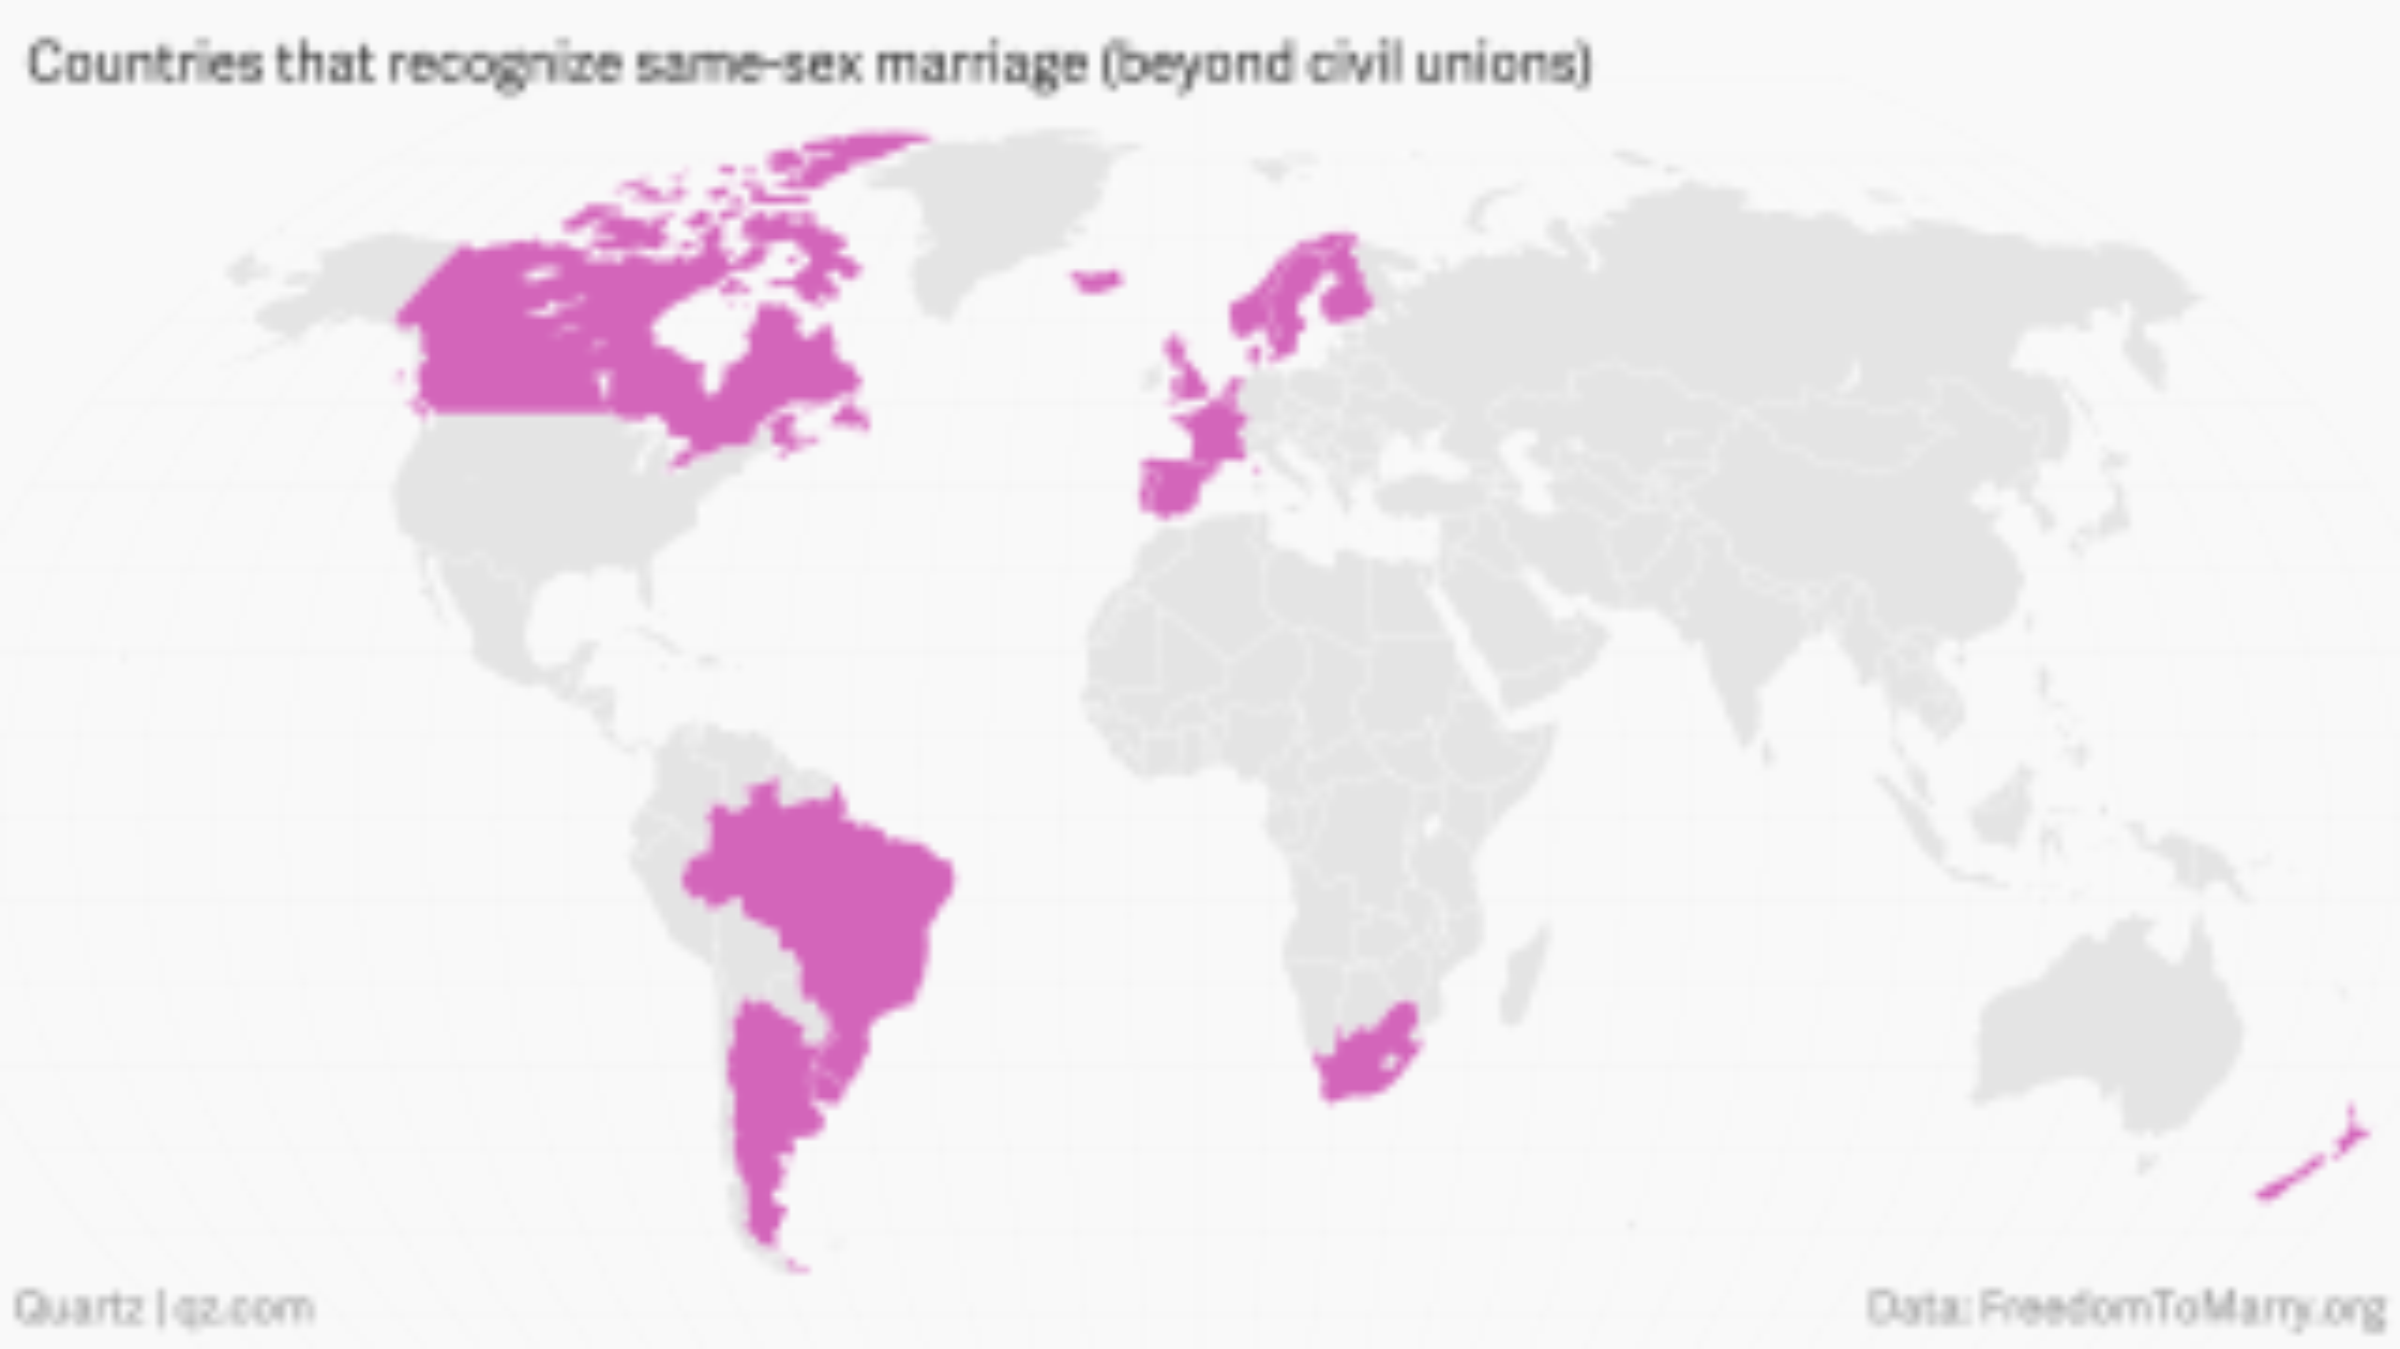 Countries-that-recognize-same-sex-marriage-beyond-civil-unions-_mapbuilder